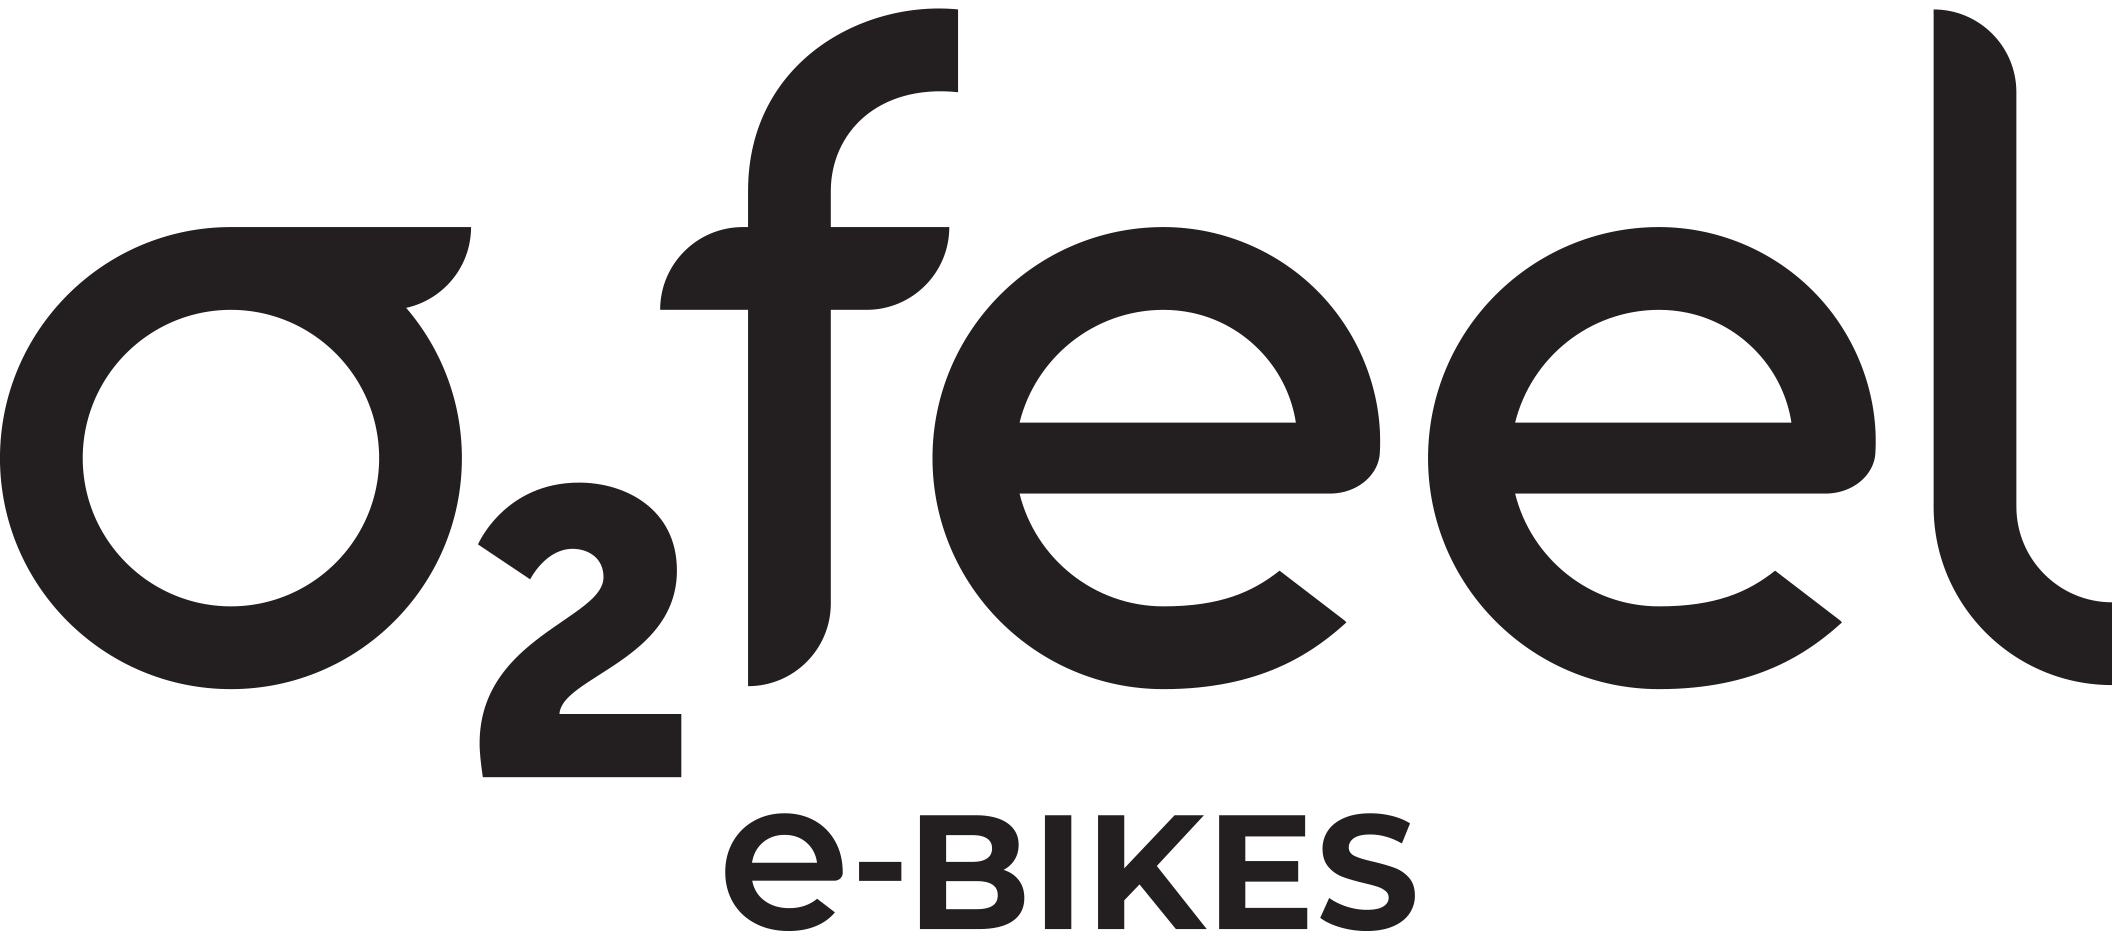 The O2feel e-bikes logo